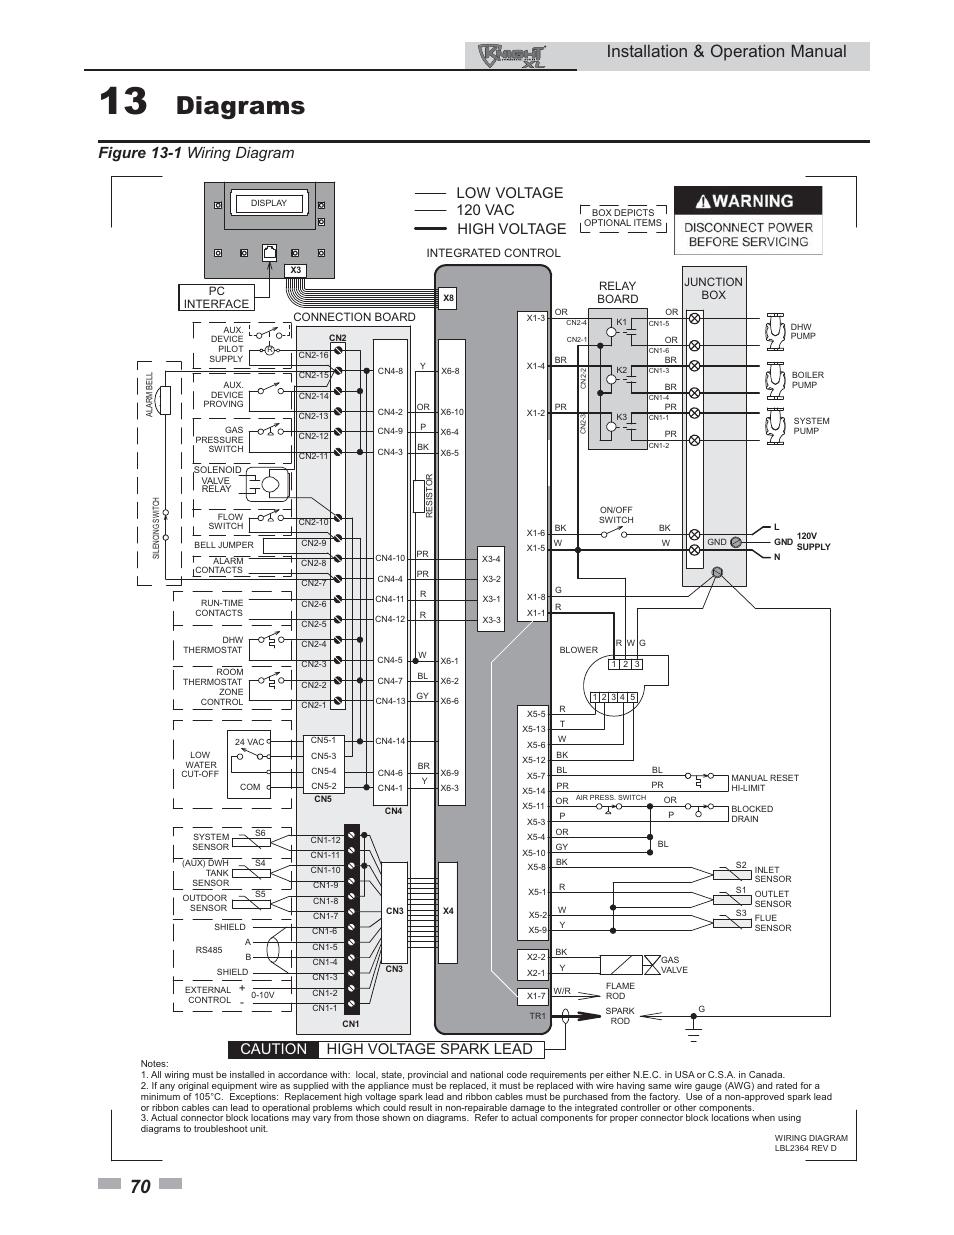 Lochinvar Wiring Diagram - Complete Wiring Diagrams •